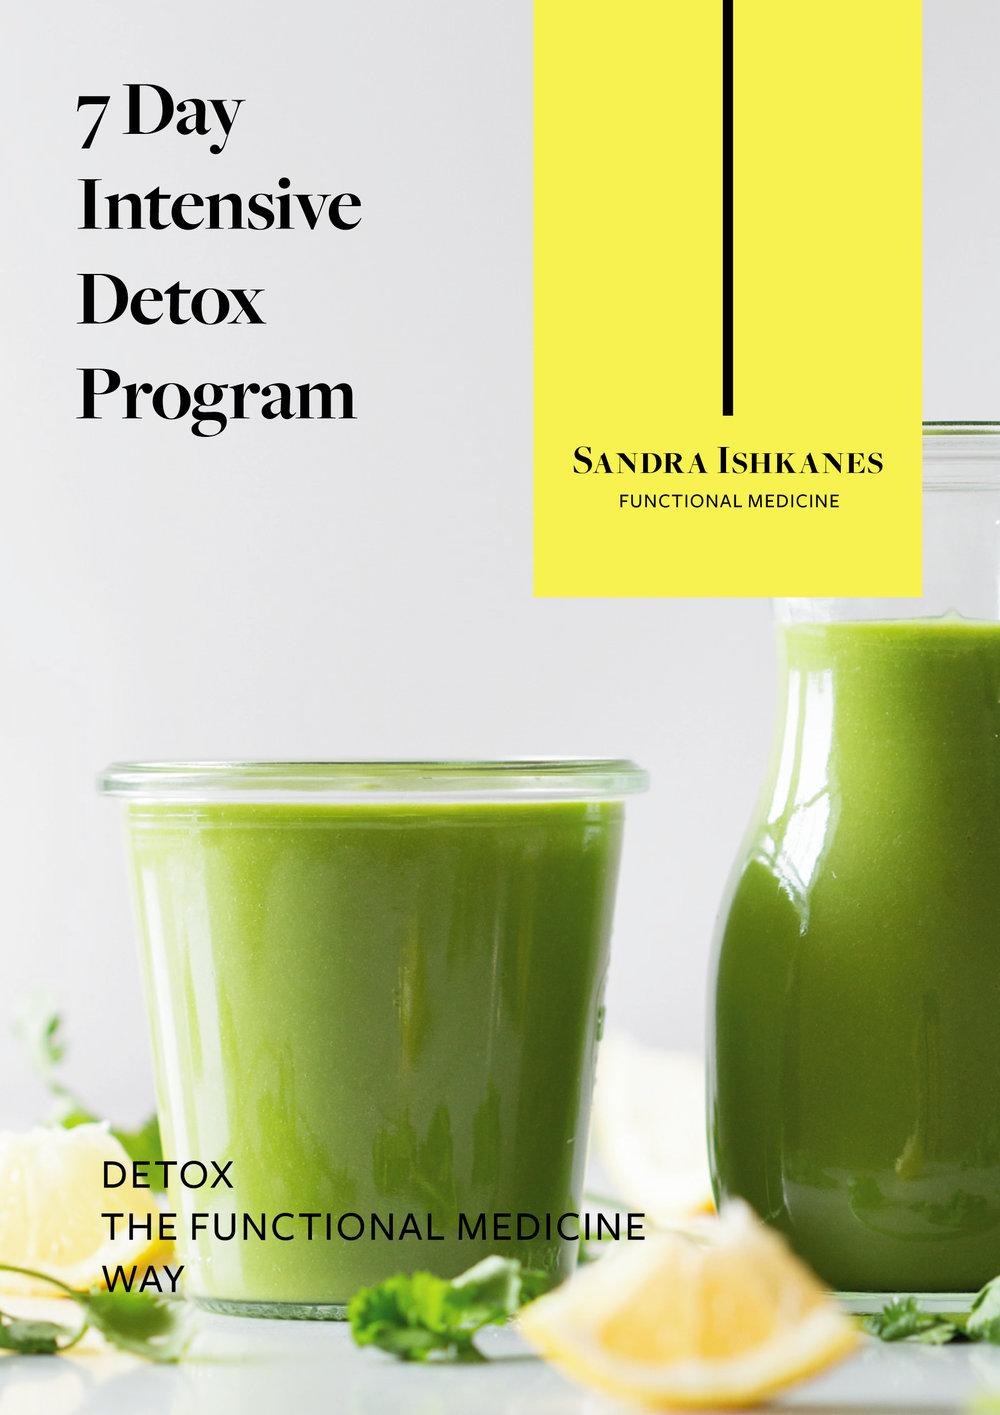 7-Day-Detox---Flyer-front3.jpg